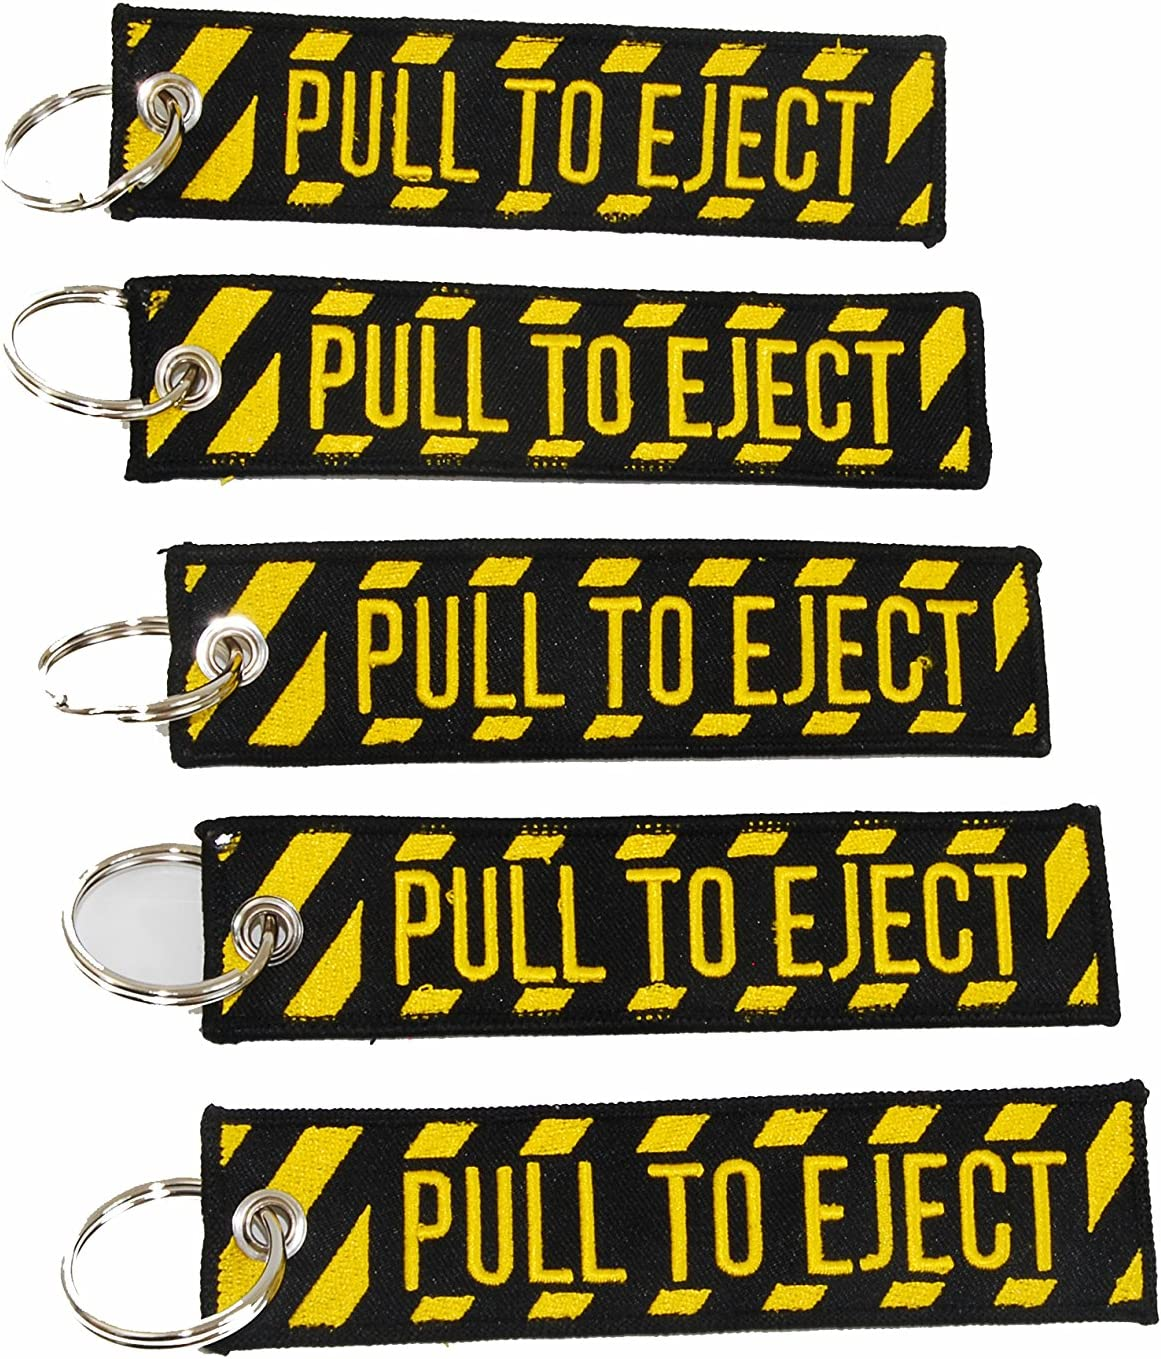 OZ-USA 10 Pull to Eject Key Chain Aviation ATV utv Motorcycle Pilot Crew tag Lock 4X rv